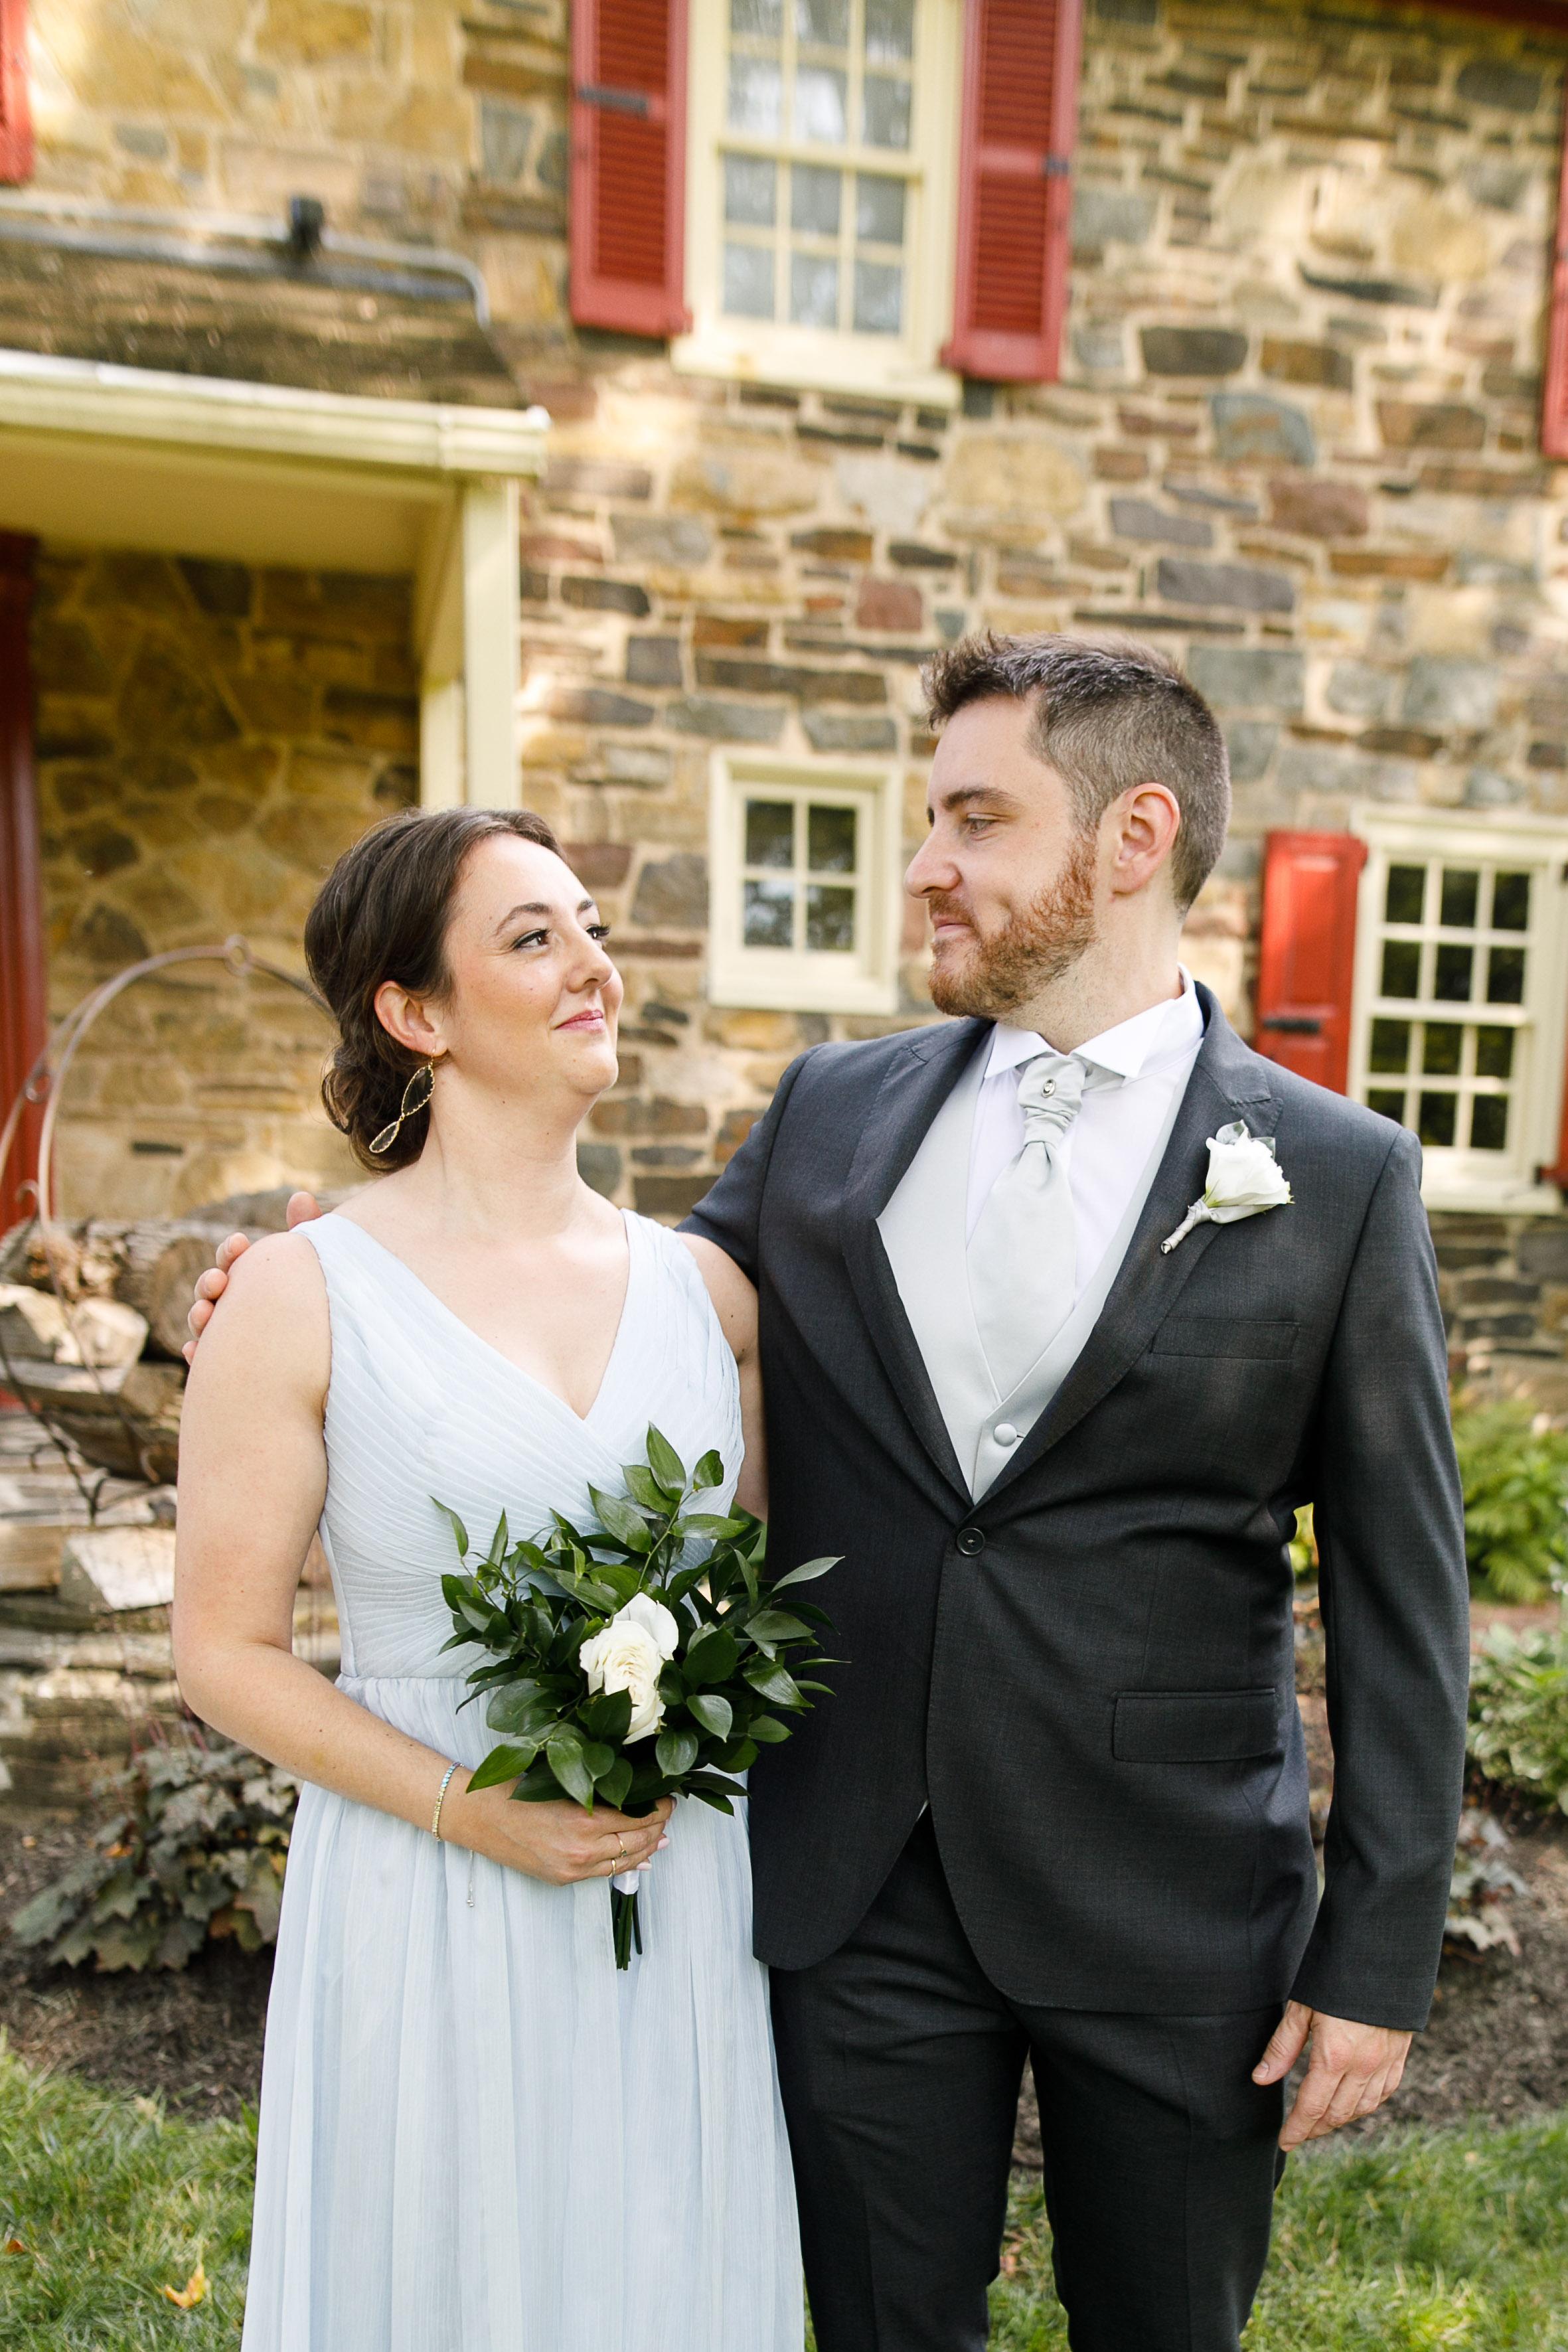 Wedding at Joseph Ambler In Bucks County PA19.jpg